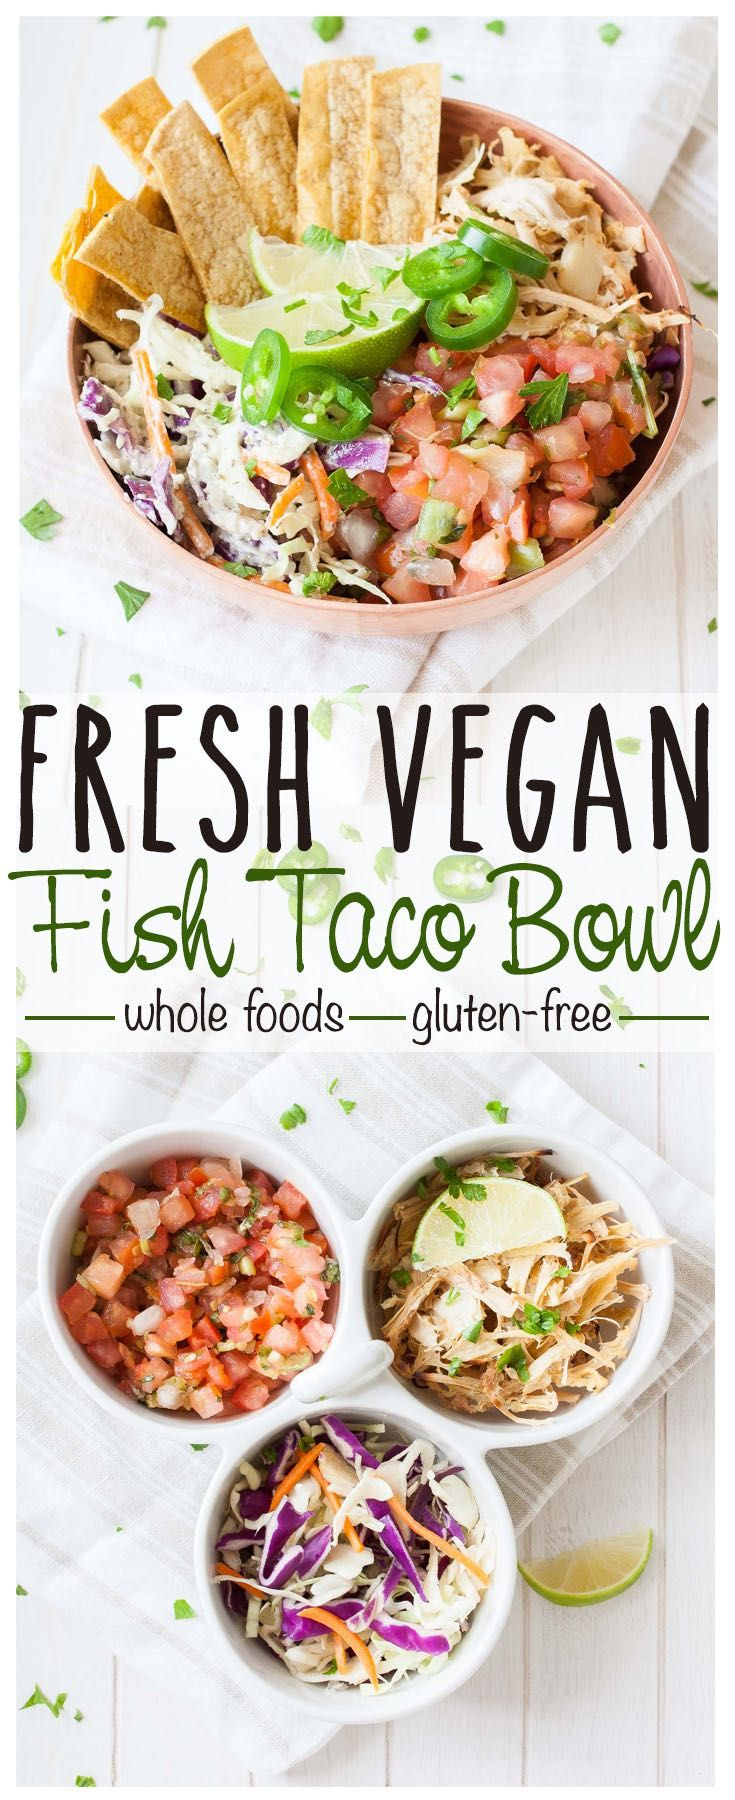 Vegan Fish Taco Bowl | www.veggiesdontbite.com | #vegan #wholefoods #glutenfree…